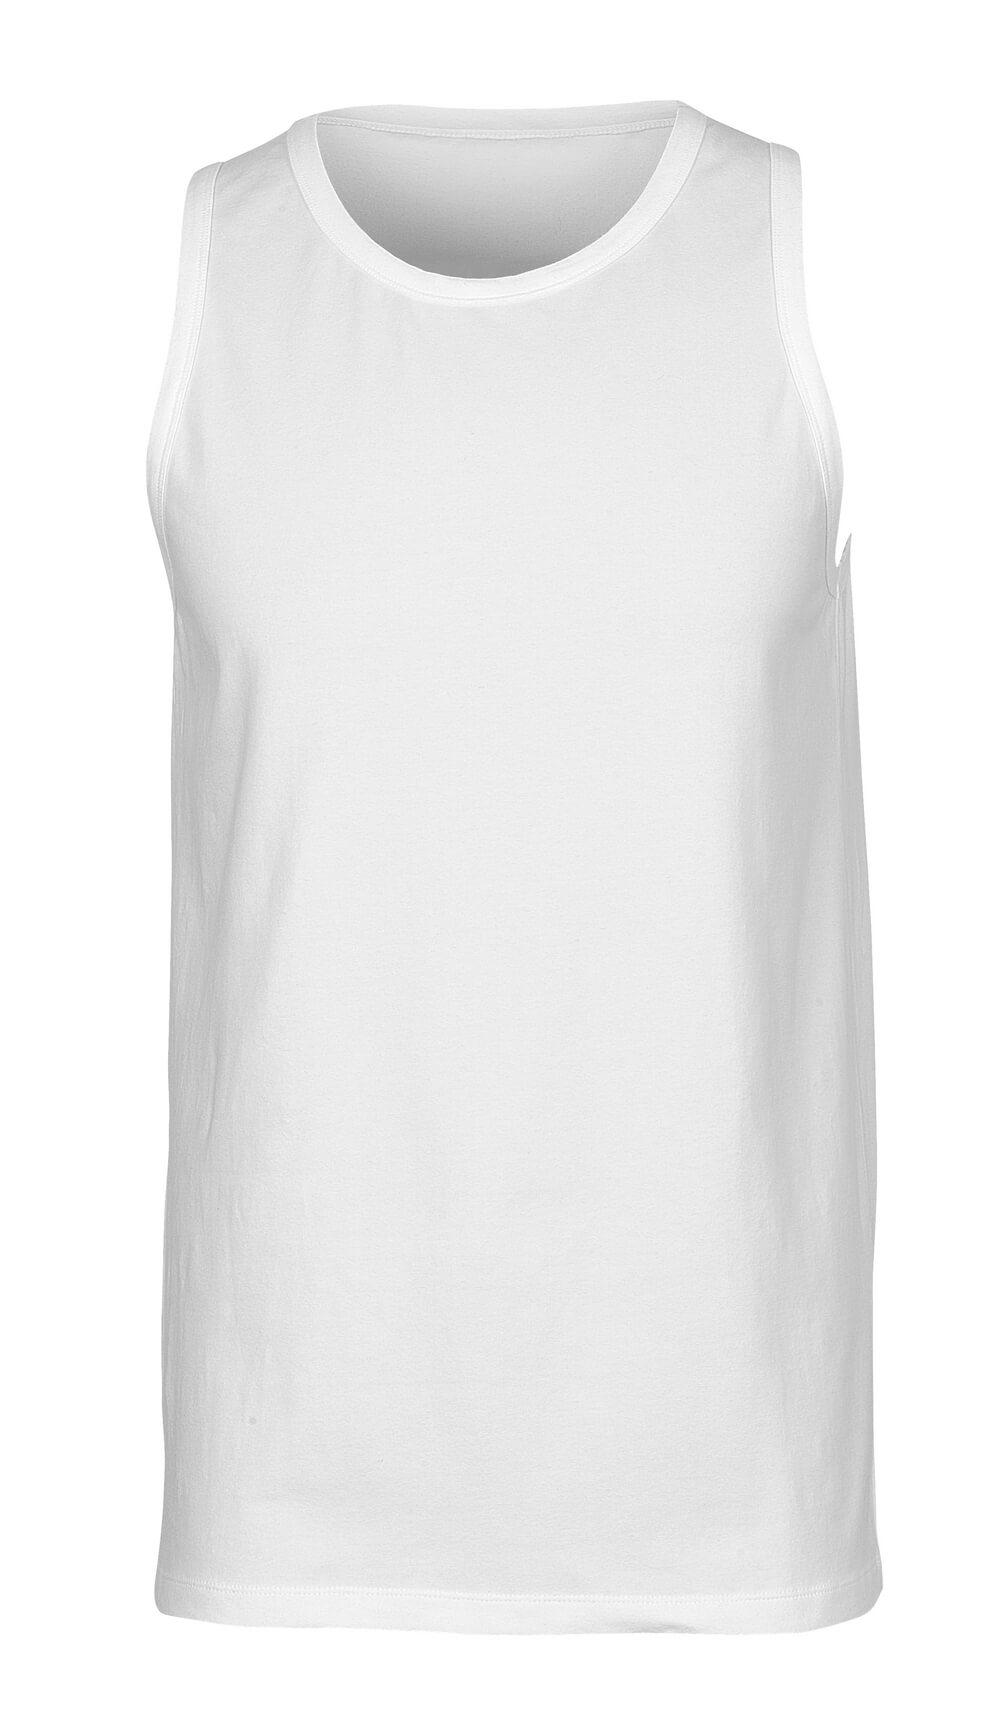 50031-847-06 Under Shirt - white